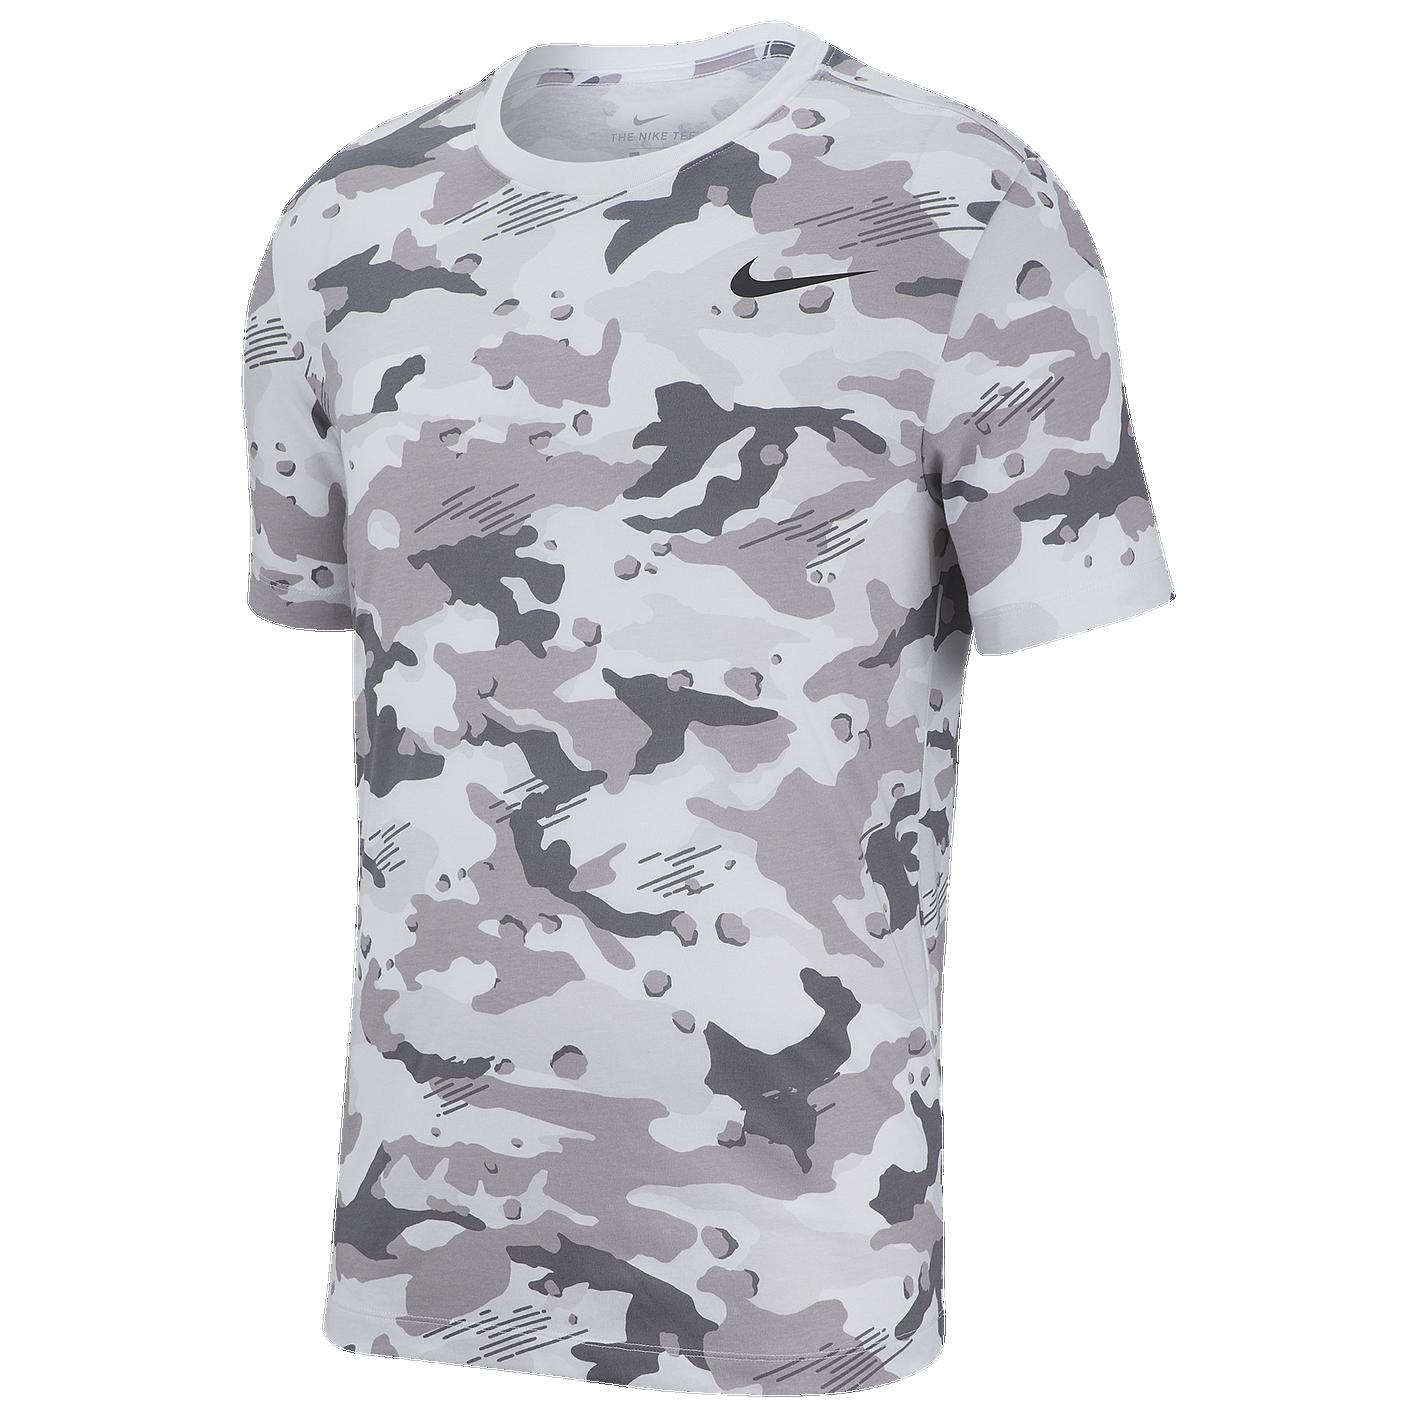 64b88359d Nike Dri-FIT Cotton AOP T-Shirt - Men's - Training - Clothing ...